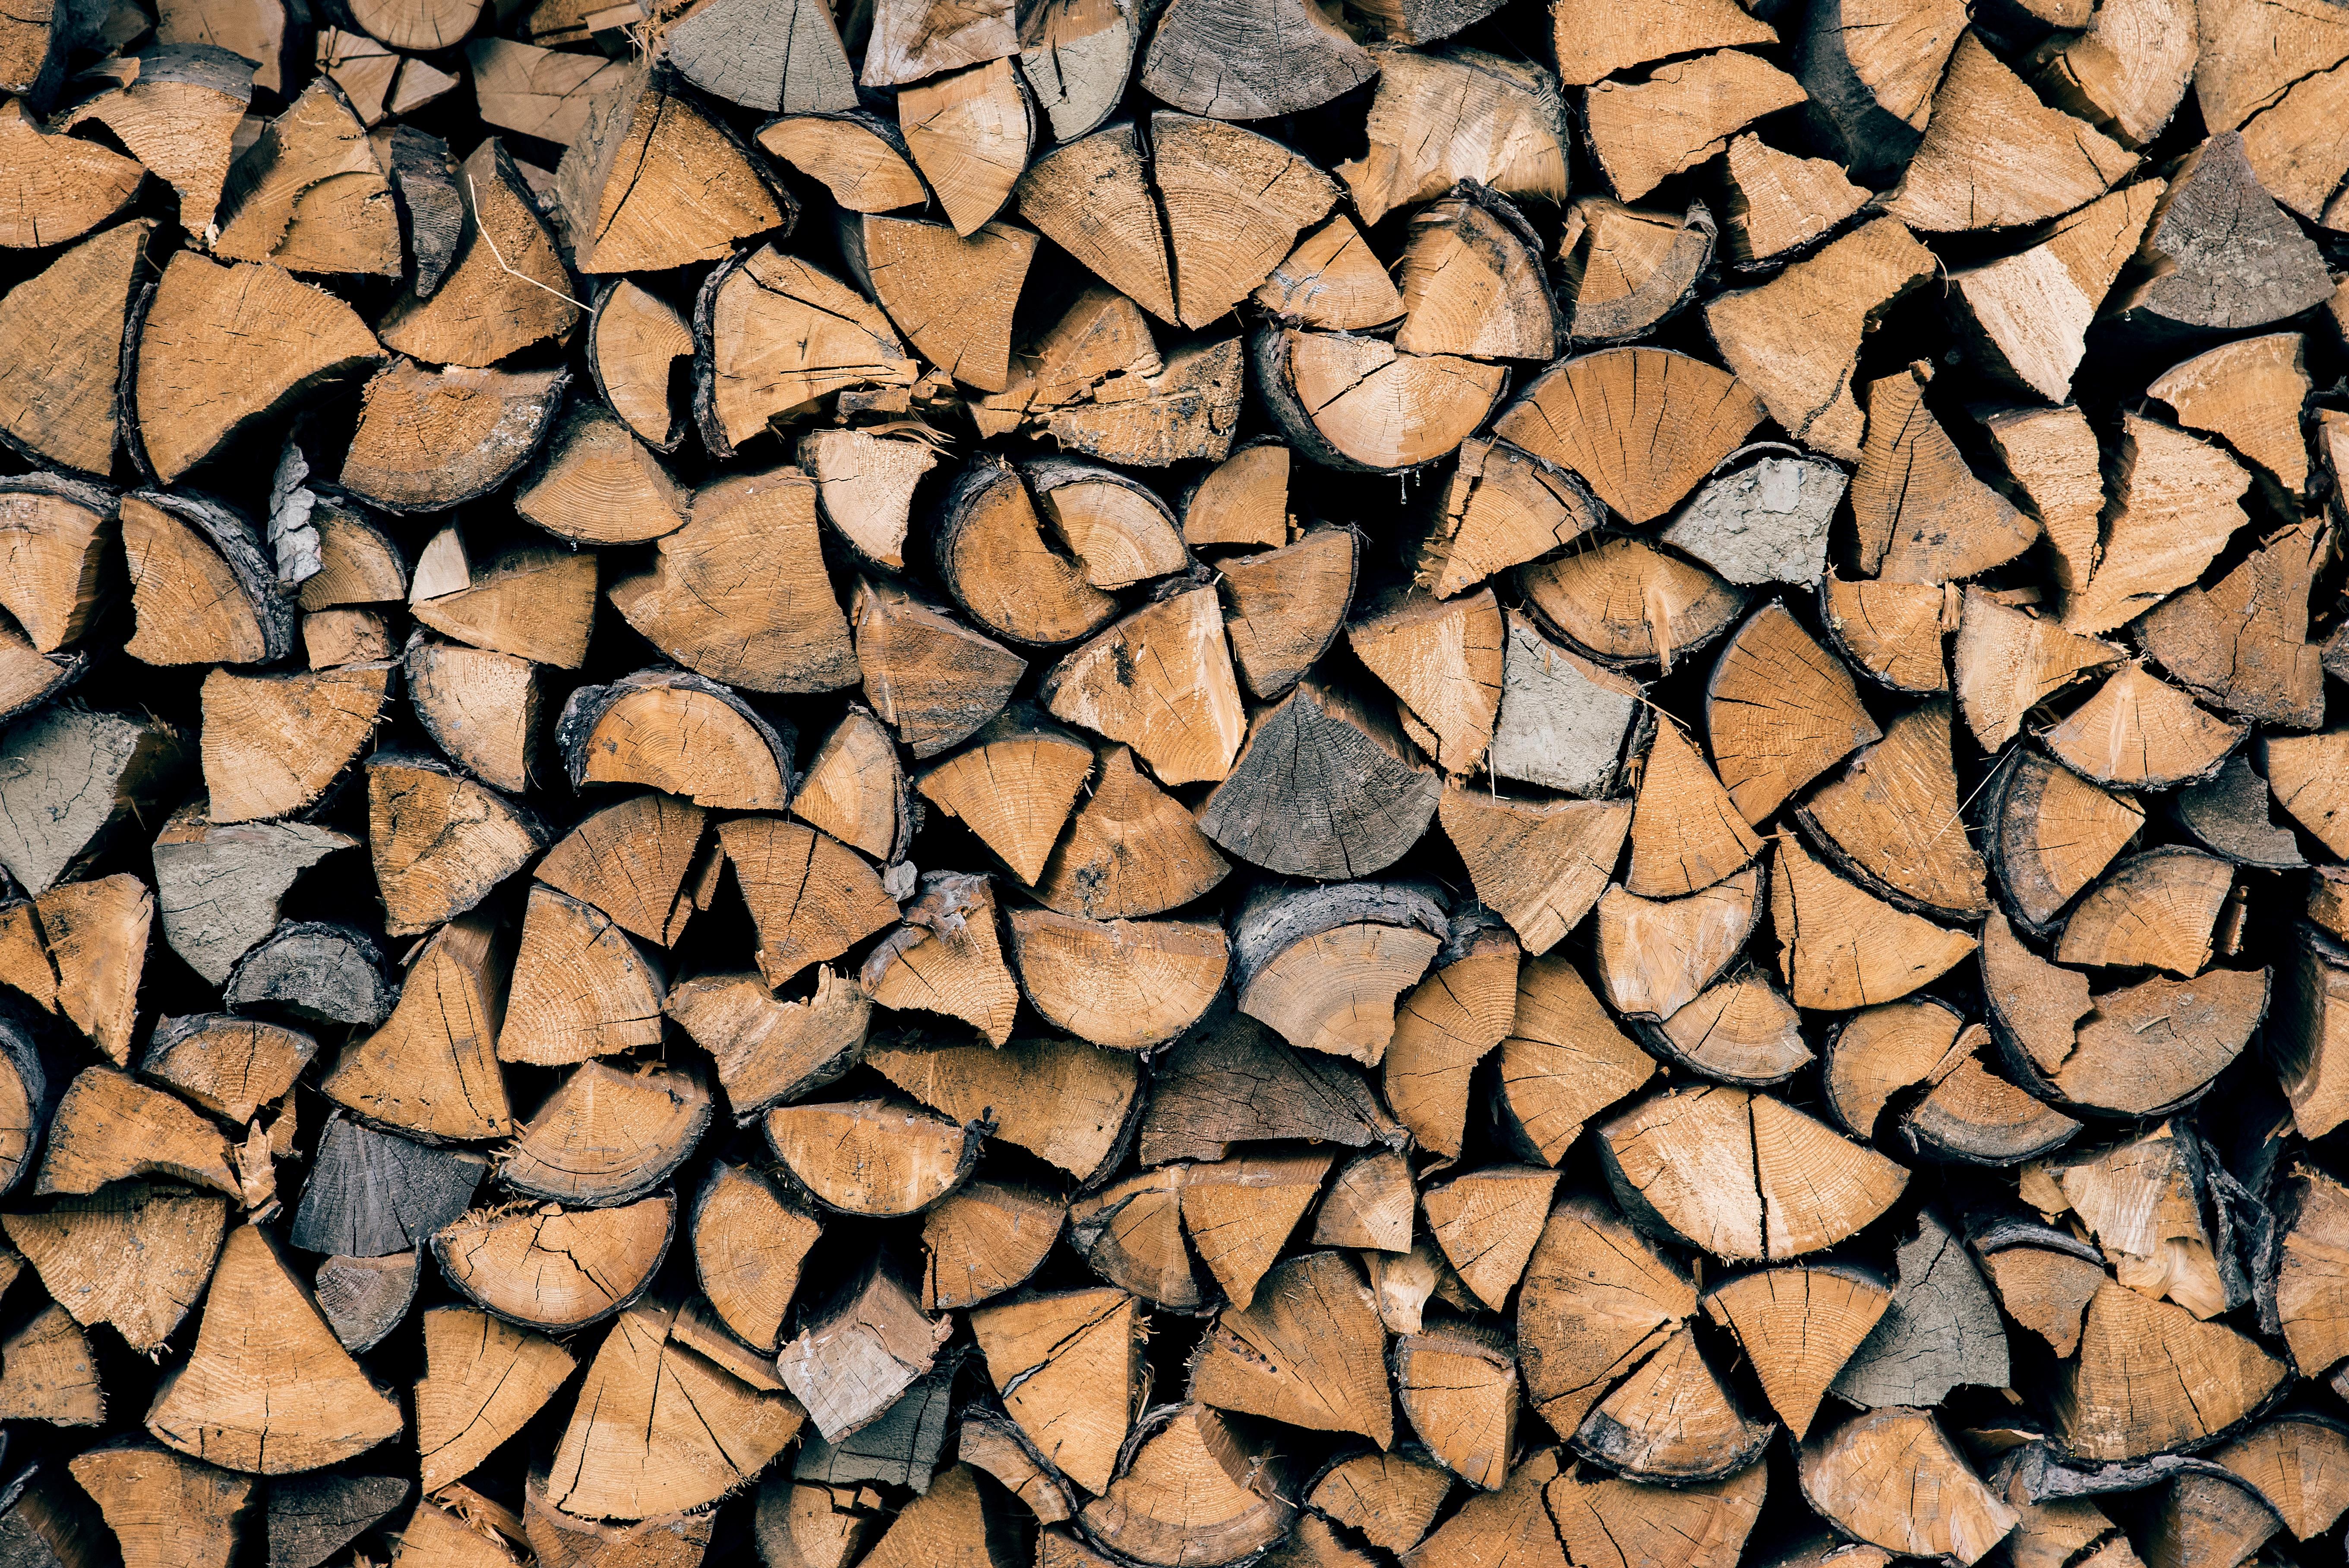 Free Images : tree, rock, branch, texture, leaf, floor